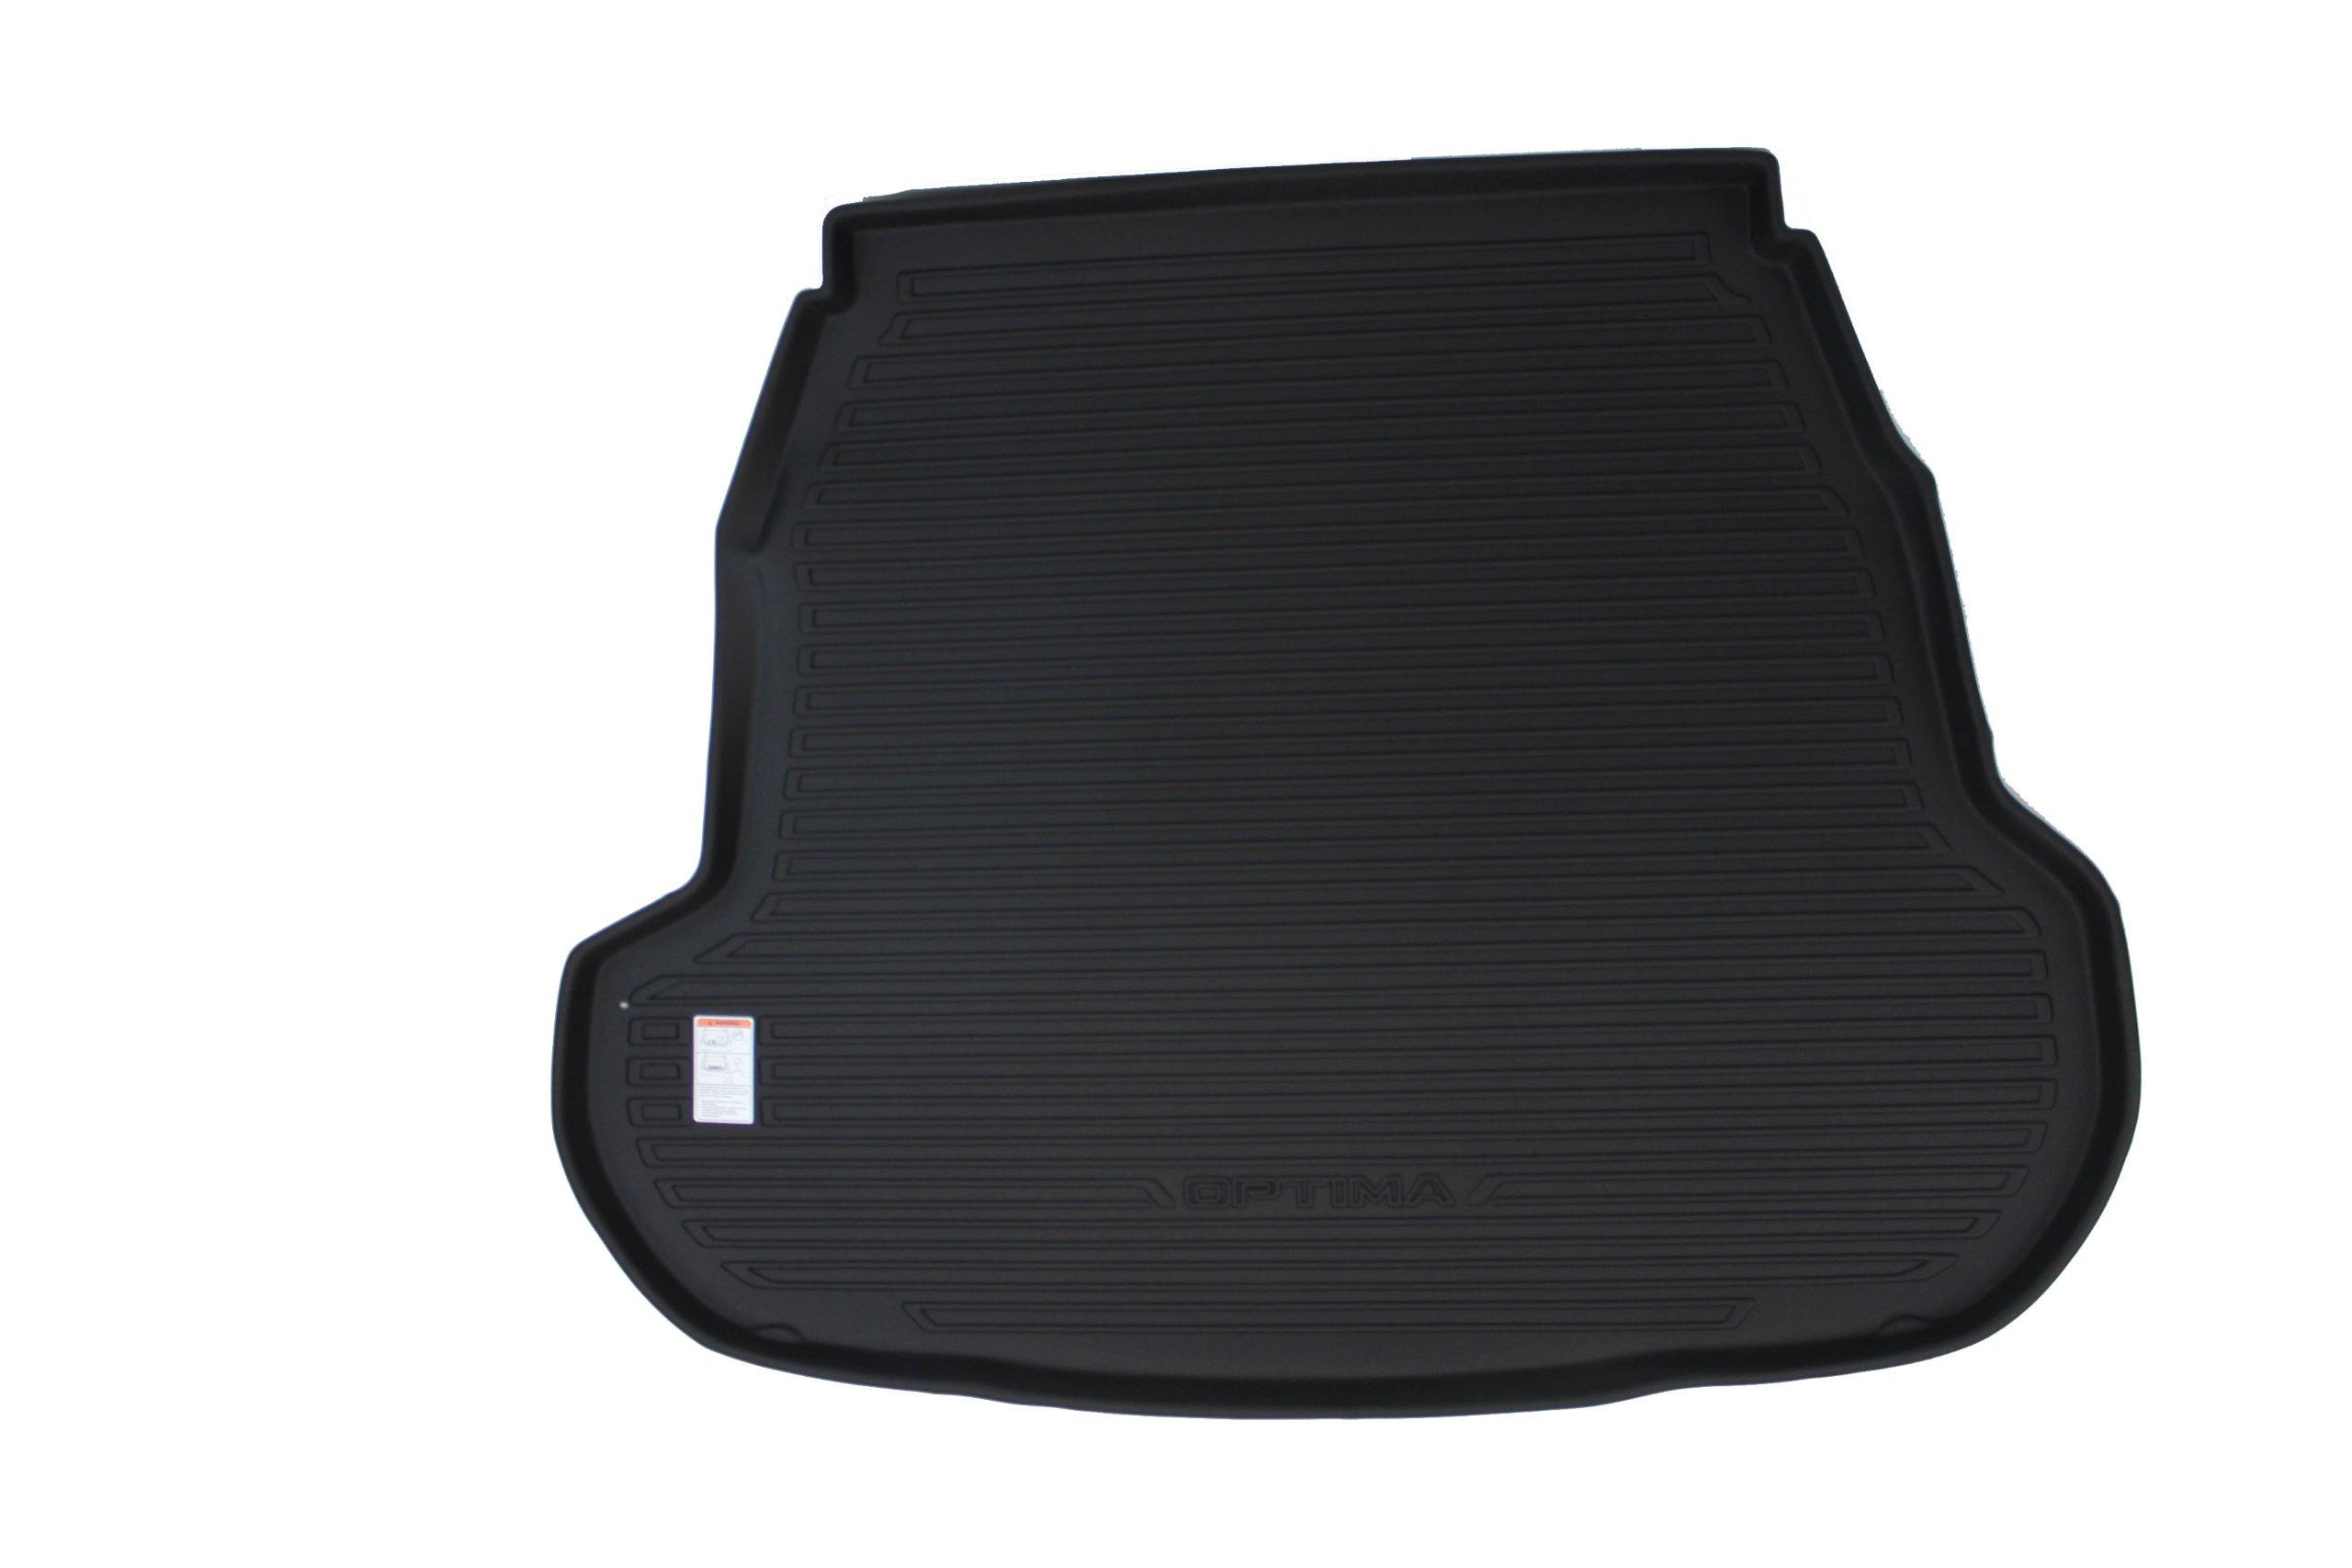 Genuine Kia Accessories 2T012-ADU00 Cargo Tray for Kia Optima Sedan by Kia